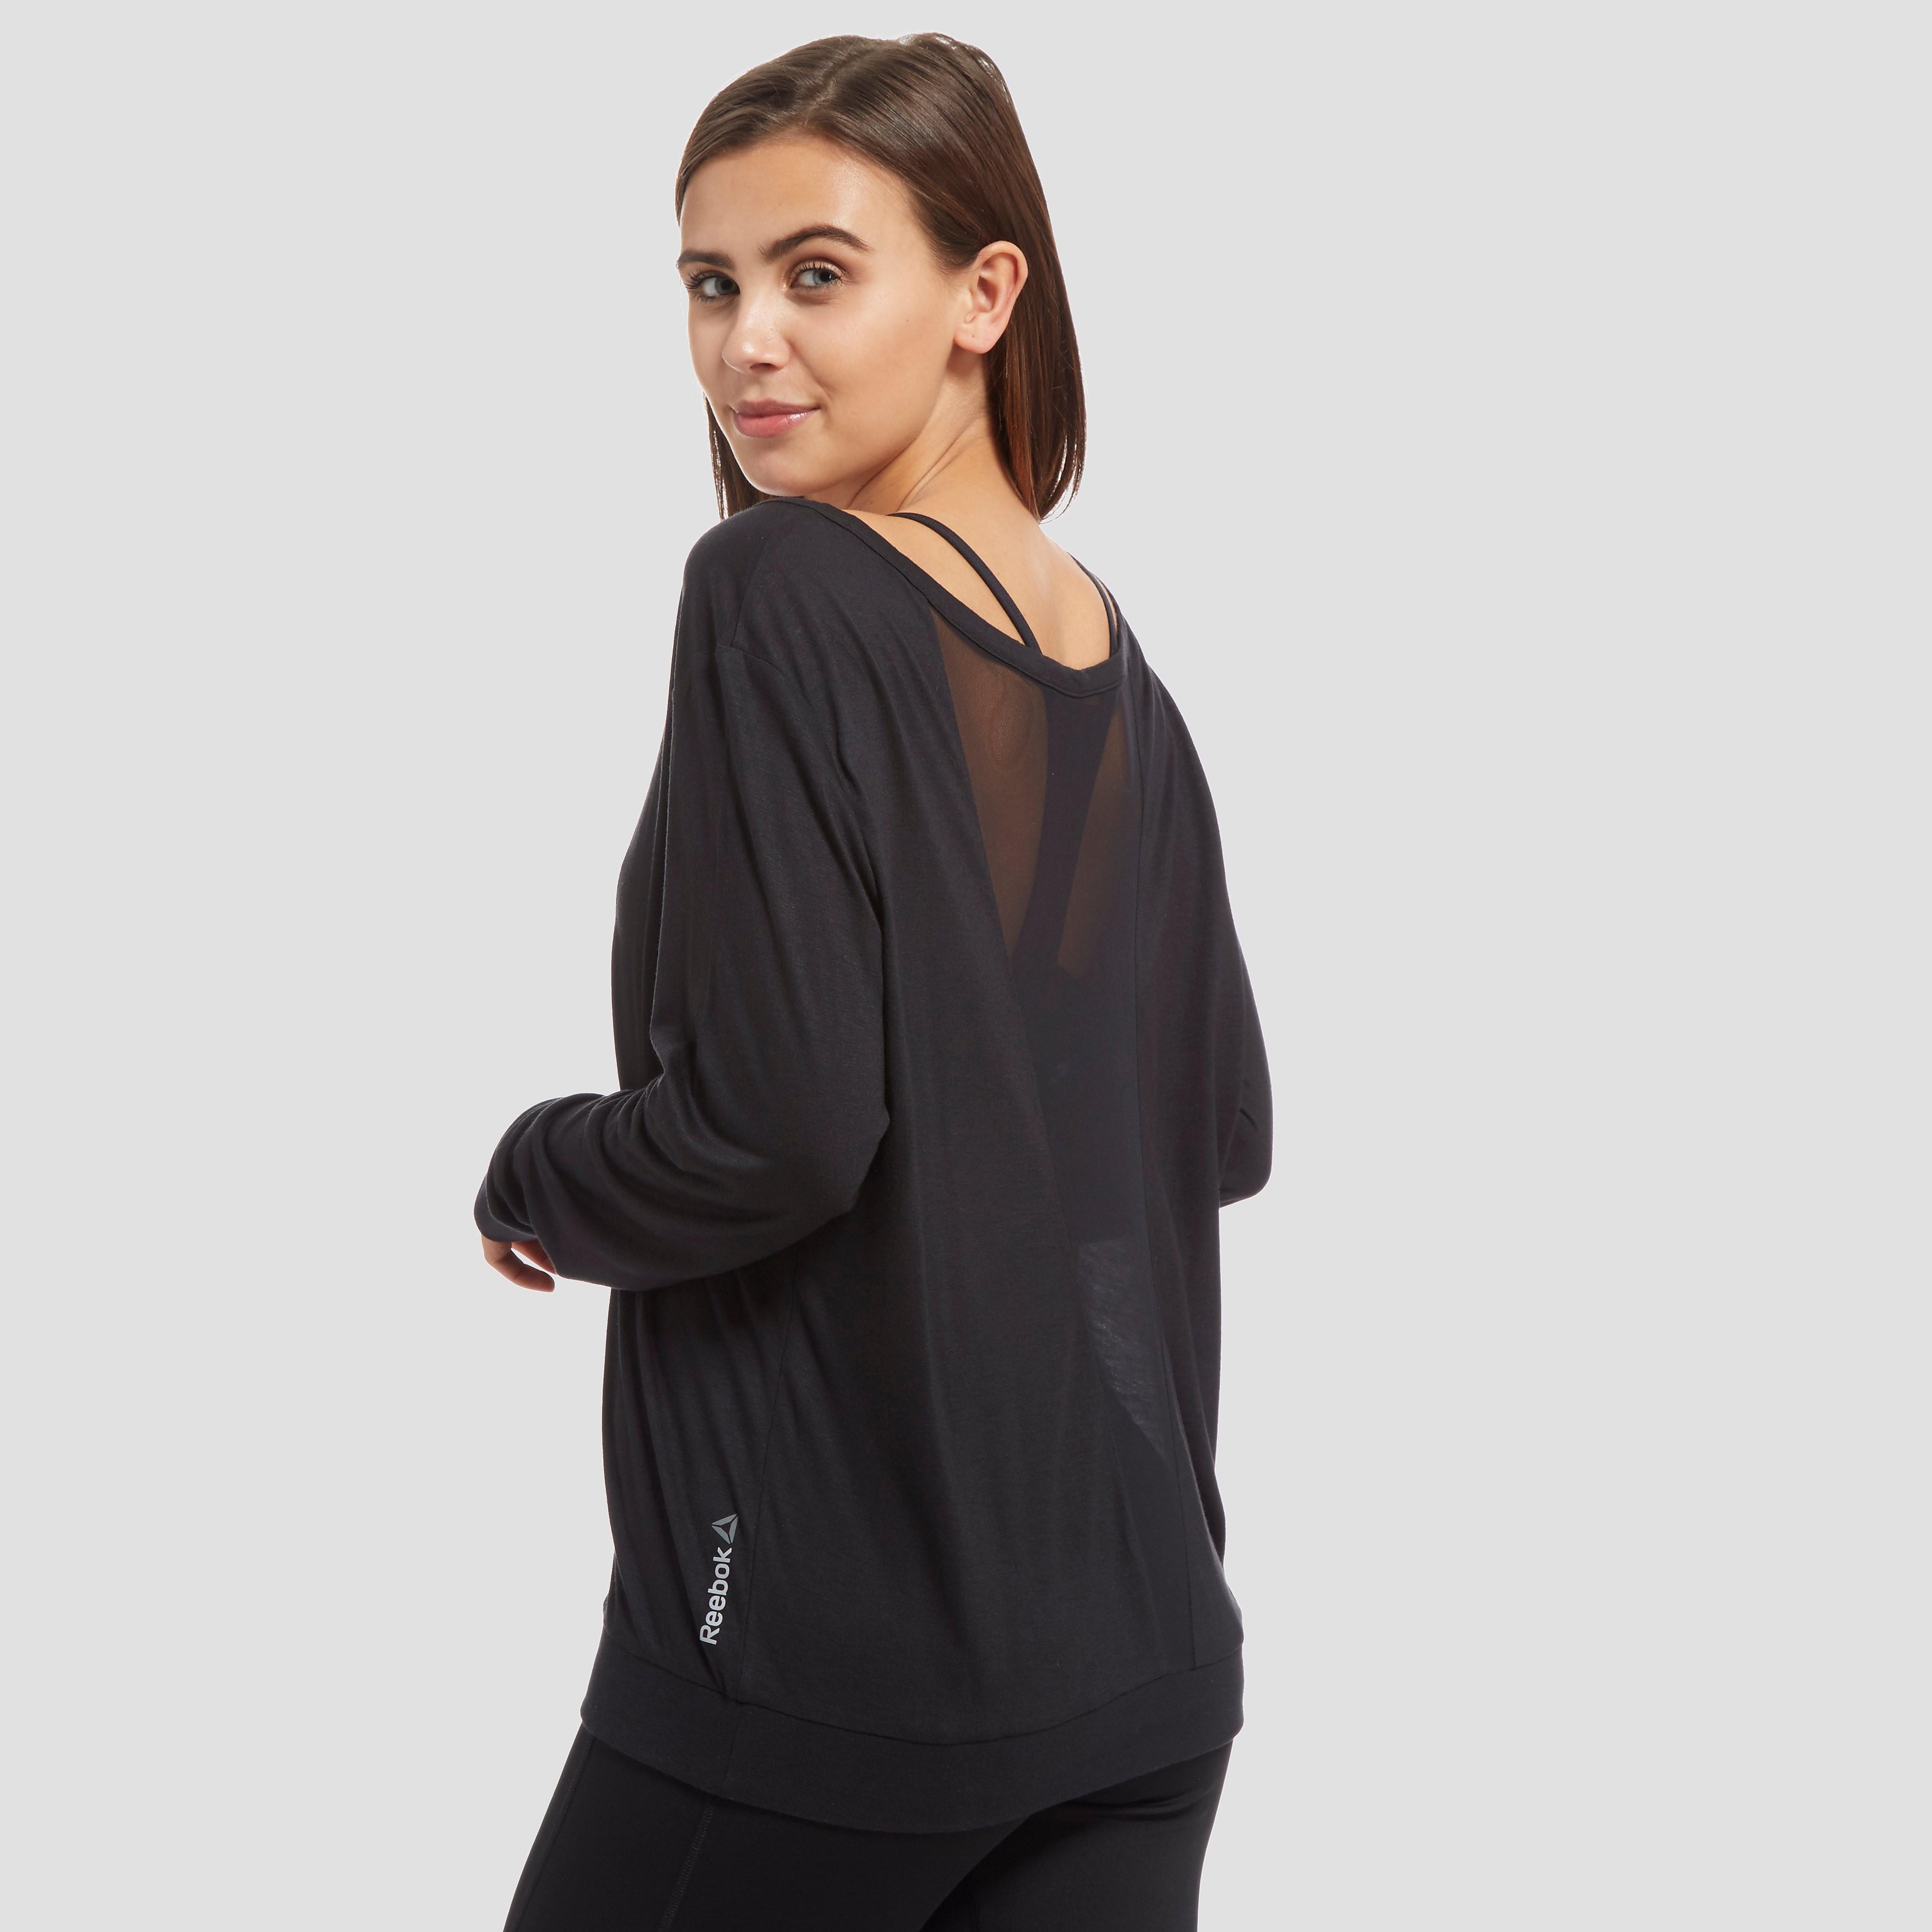 Reebok Long Sleeve Women's Mesh T-Shirt